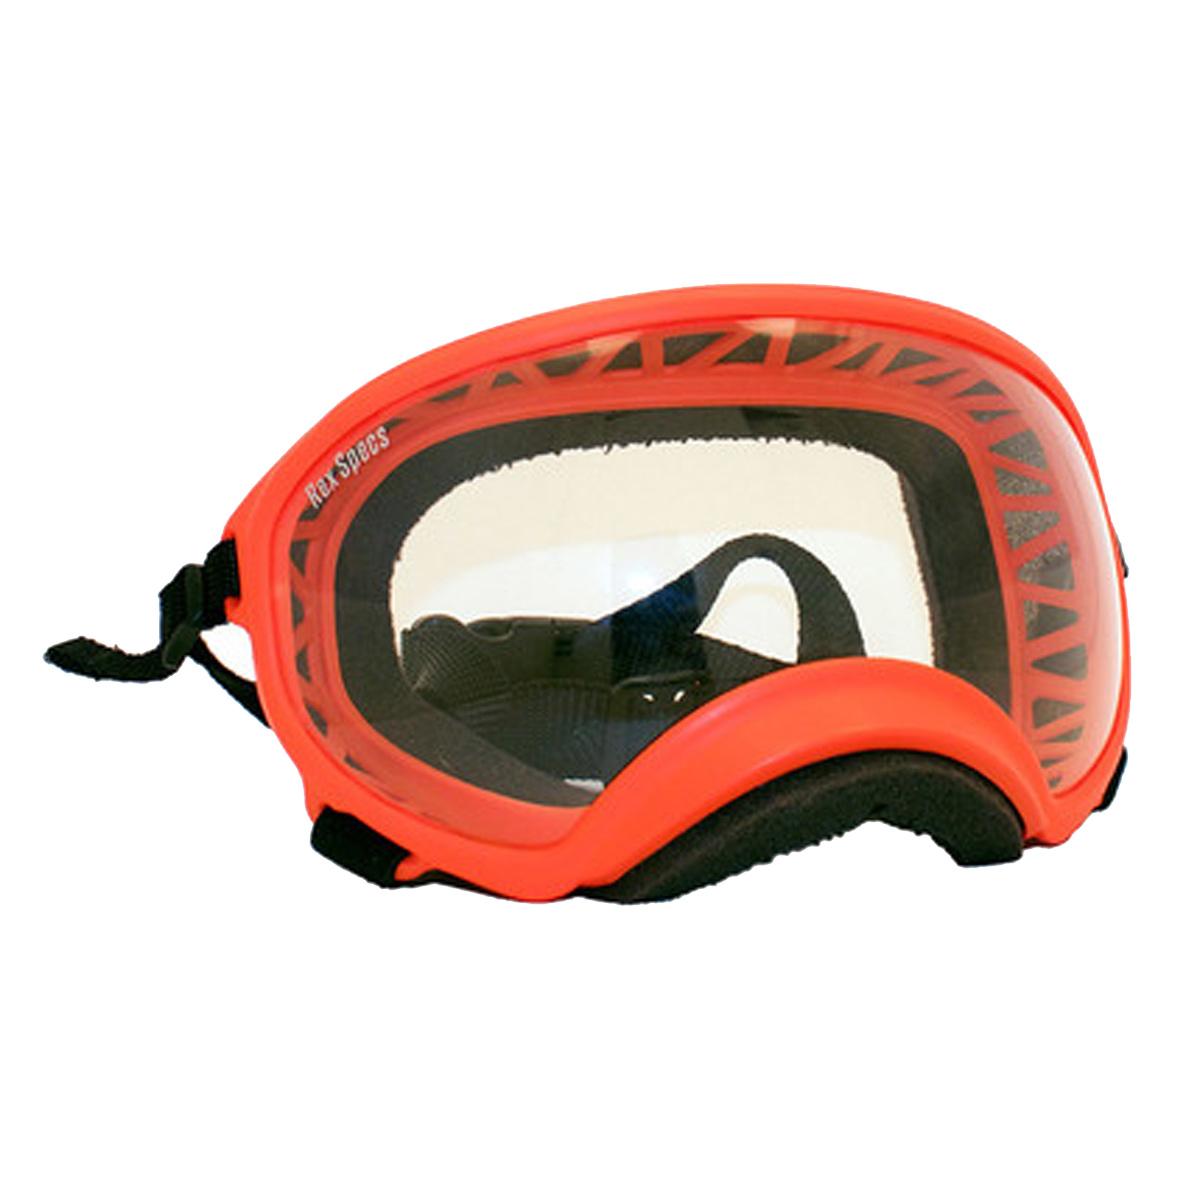 Rex Specs Dog Goggles - Orange